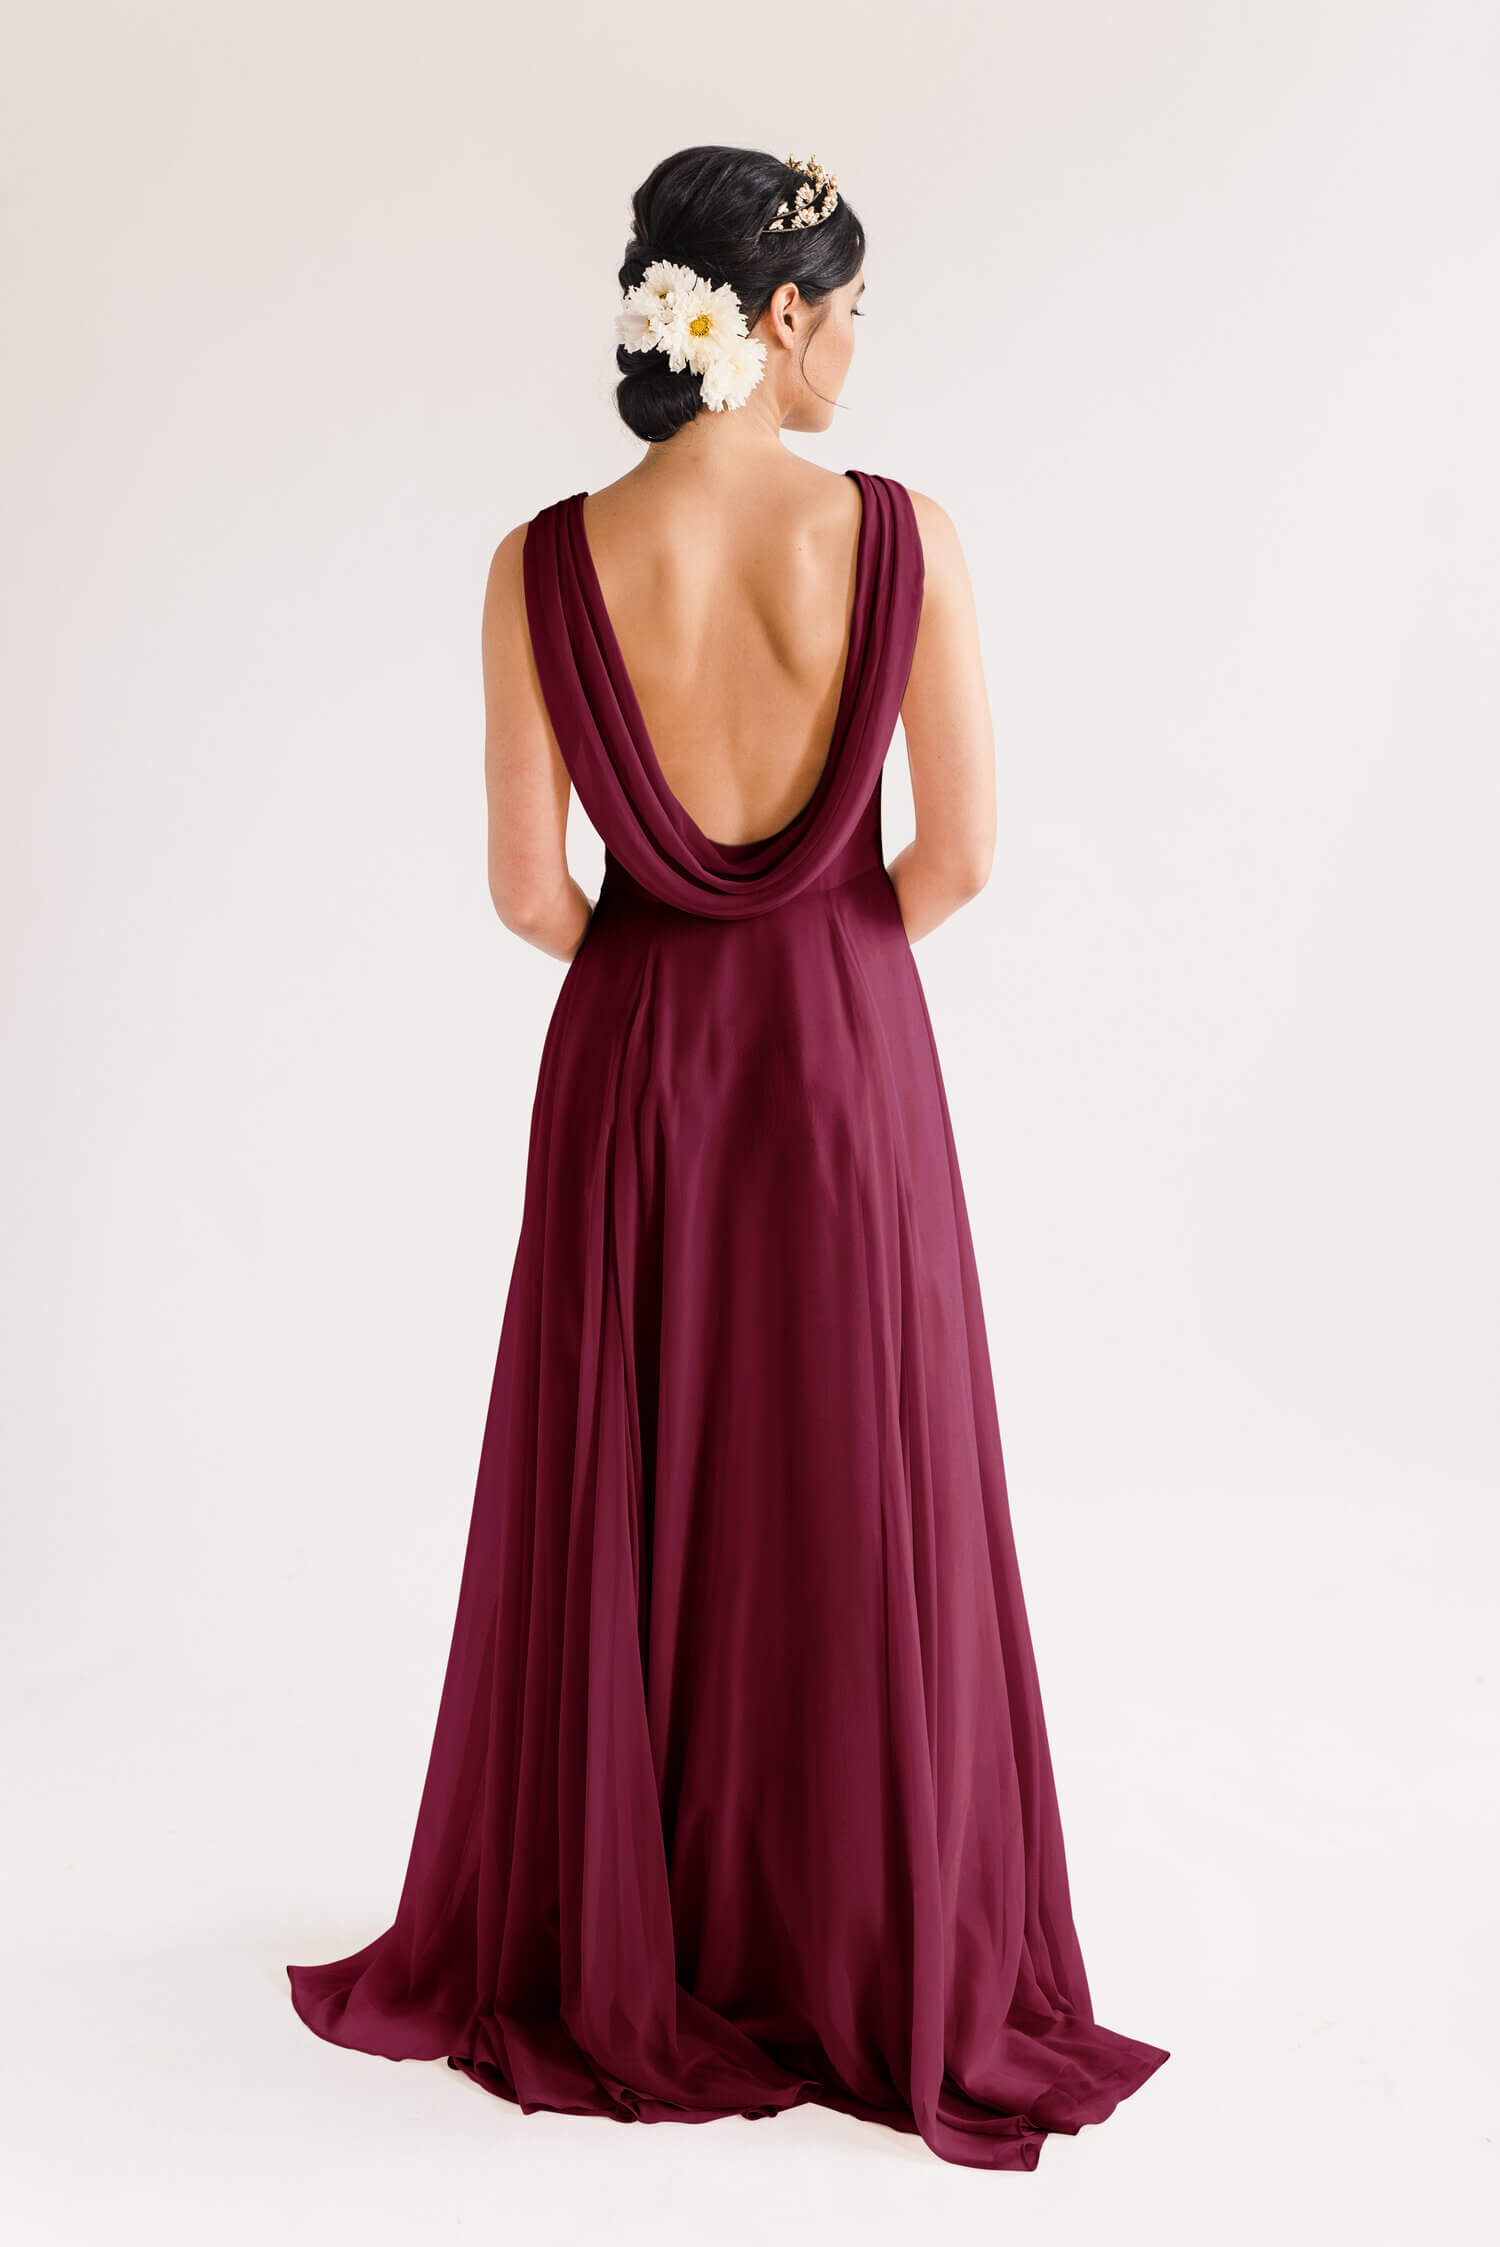 TH&H Athena Bridesmaid Dress Roseberry